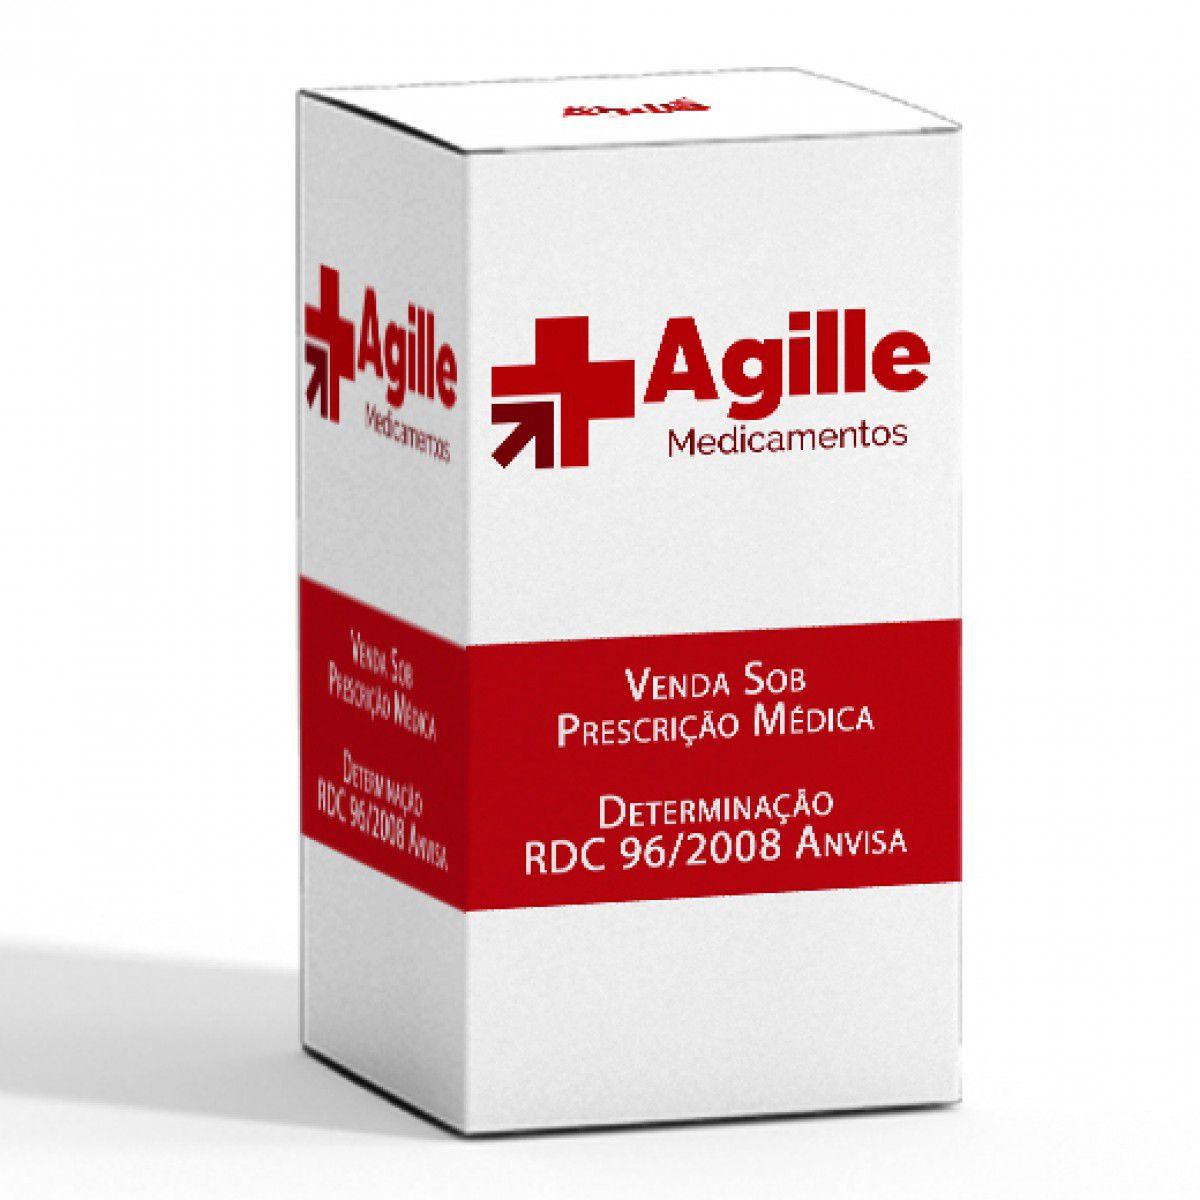 PAMIDRONATO DISSODICO 90MG (1FRA + DIL 10ML) G  - Agille Speciality